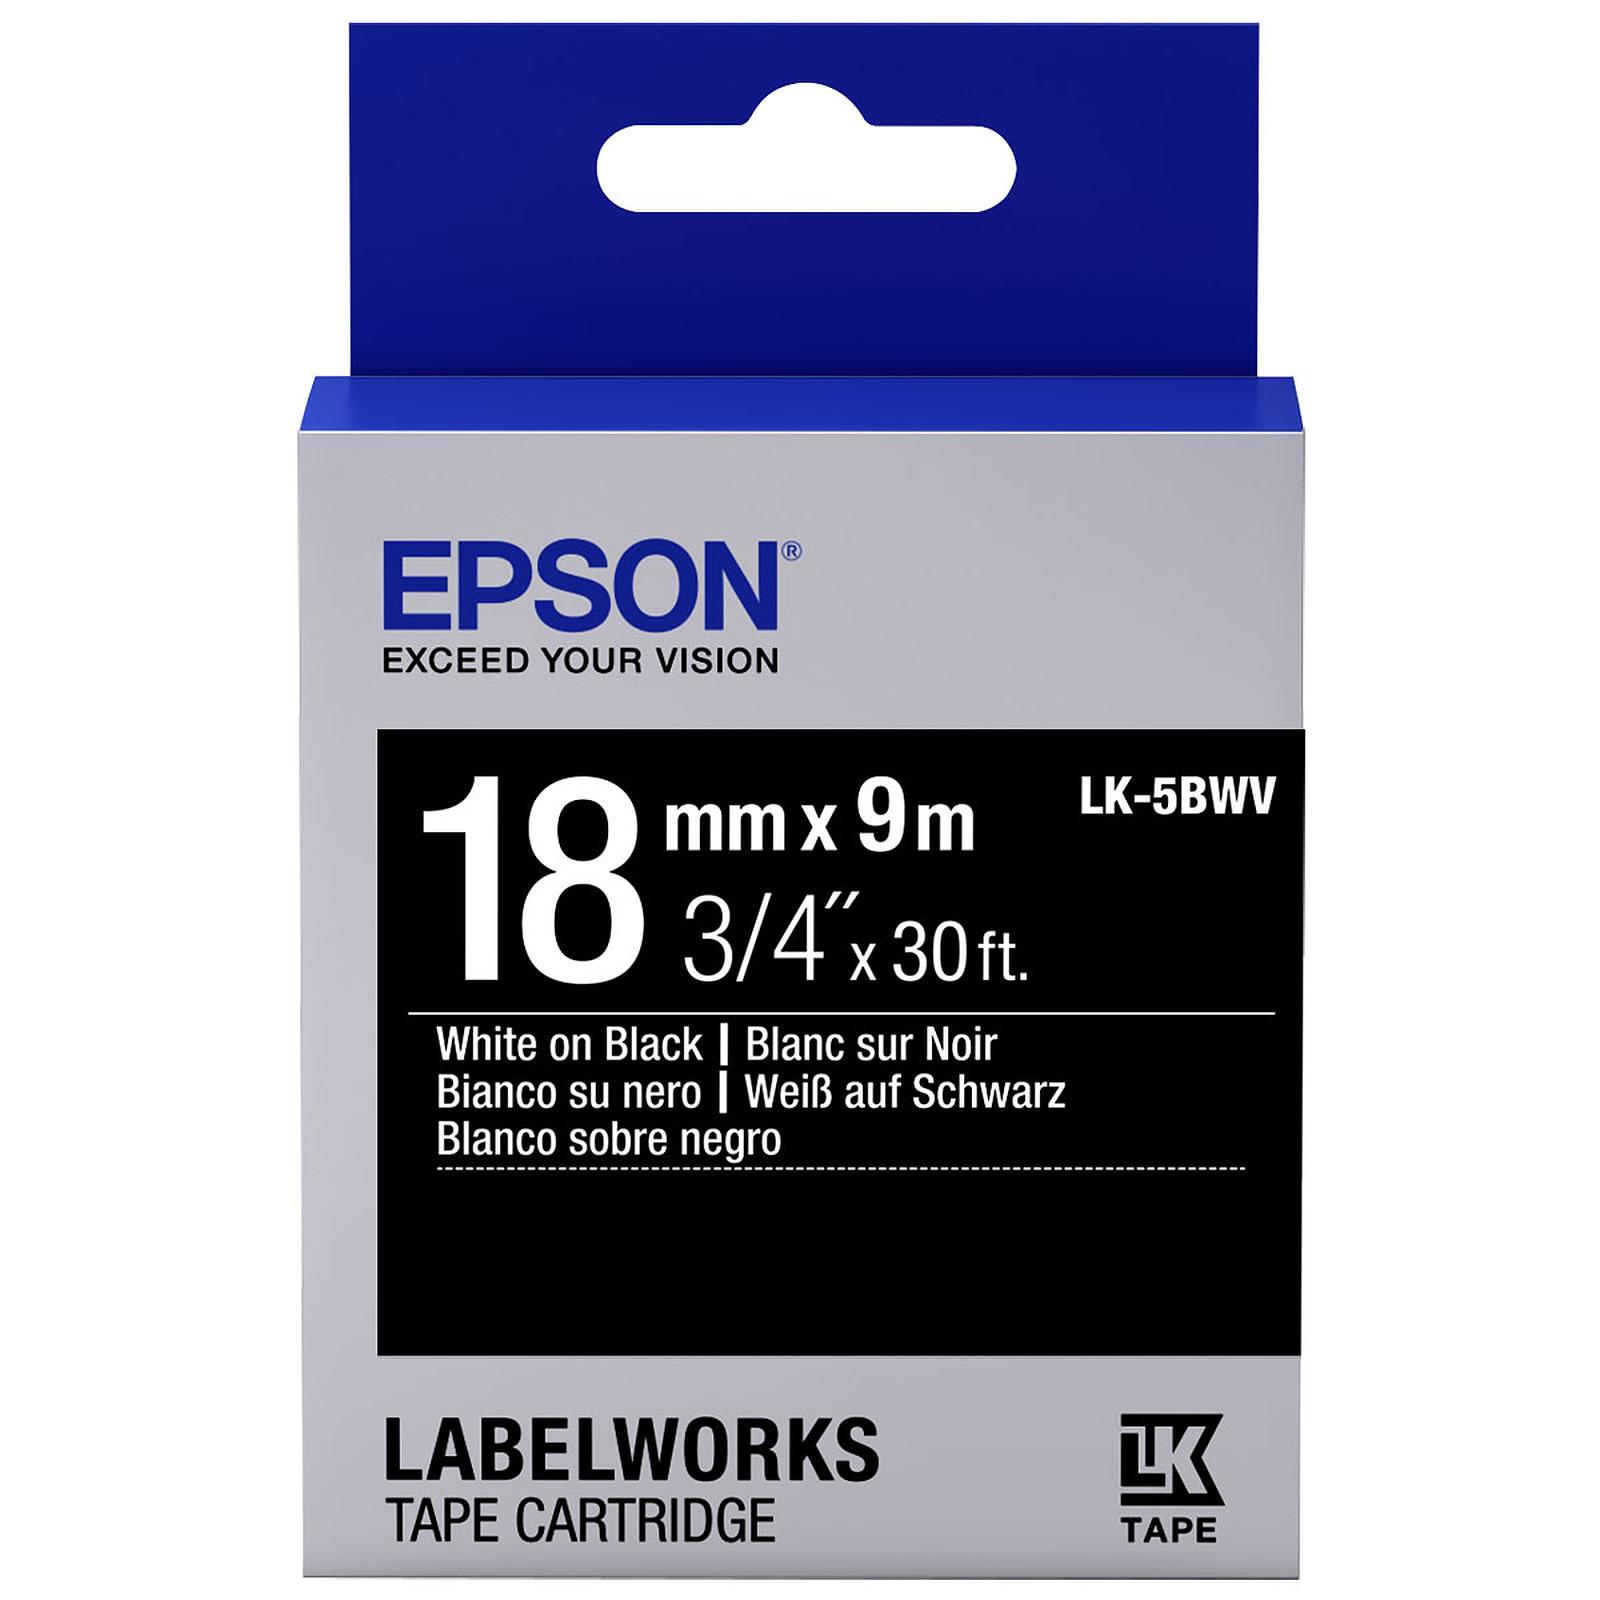 Epson LK-5BWV blanc/noir